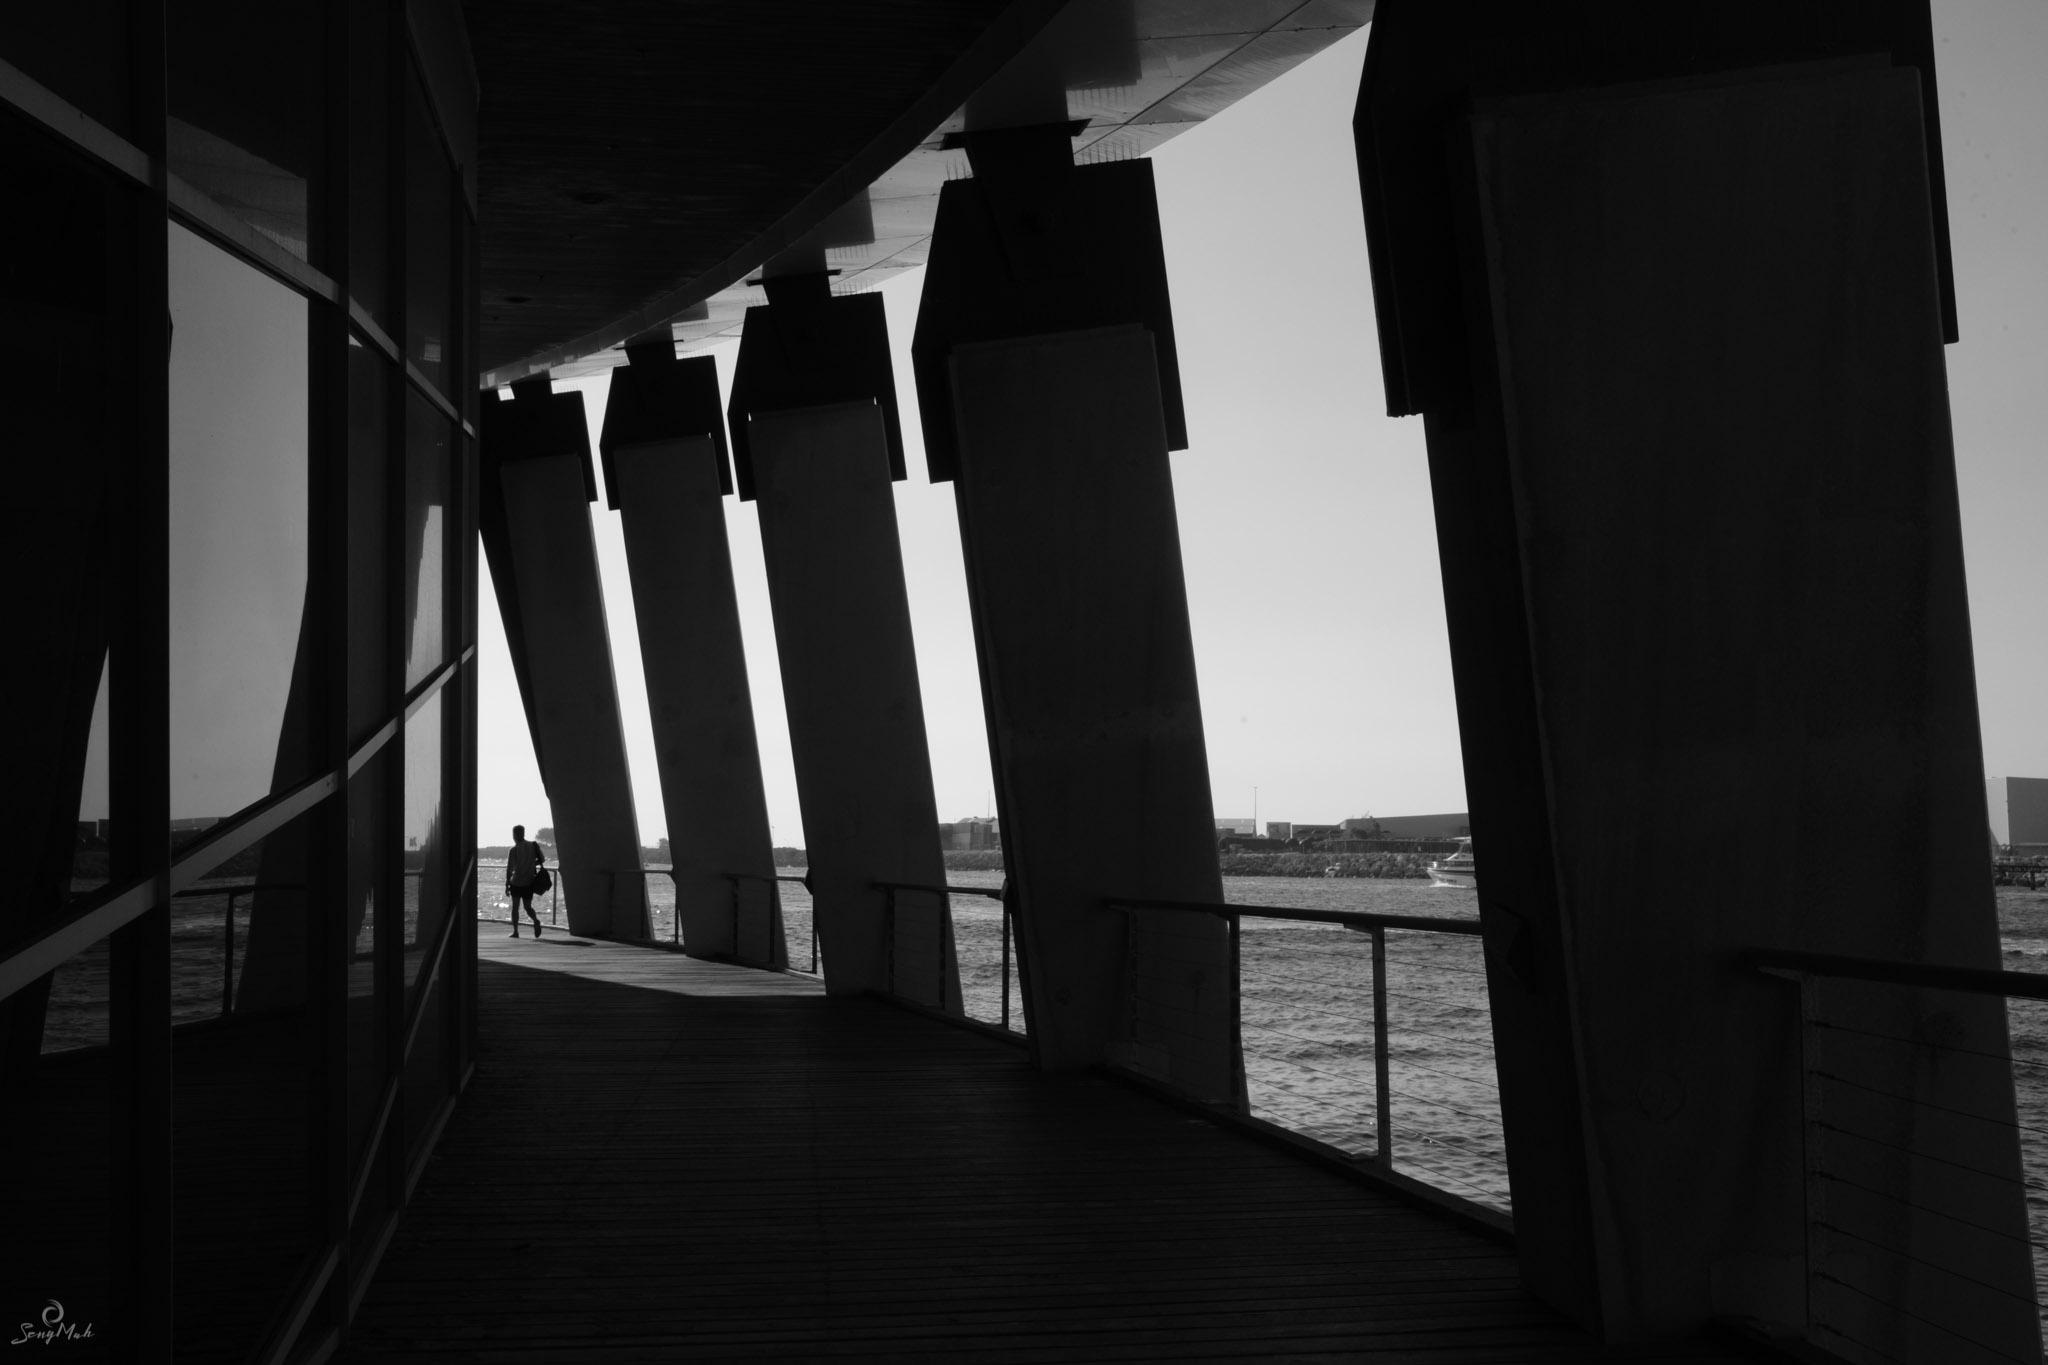 WA Maritime Museum - Fujifilm X-Pro 2